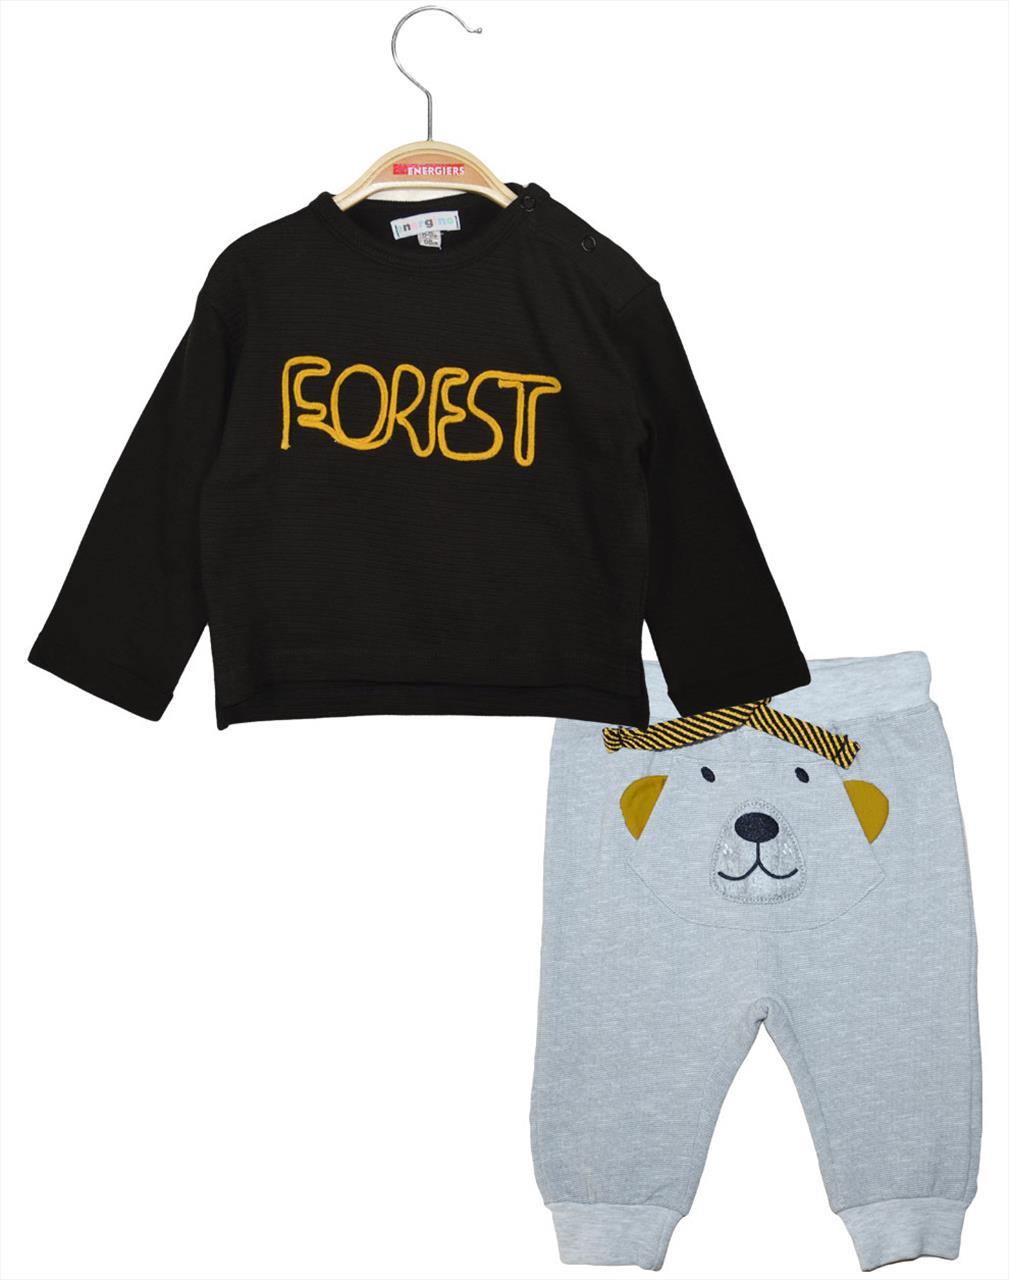 SET 2PCS JOG PANT-TSHIRT BABY BOY *FOREST BY ENERGIERS